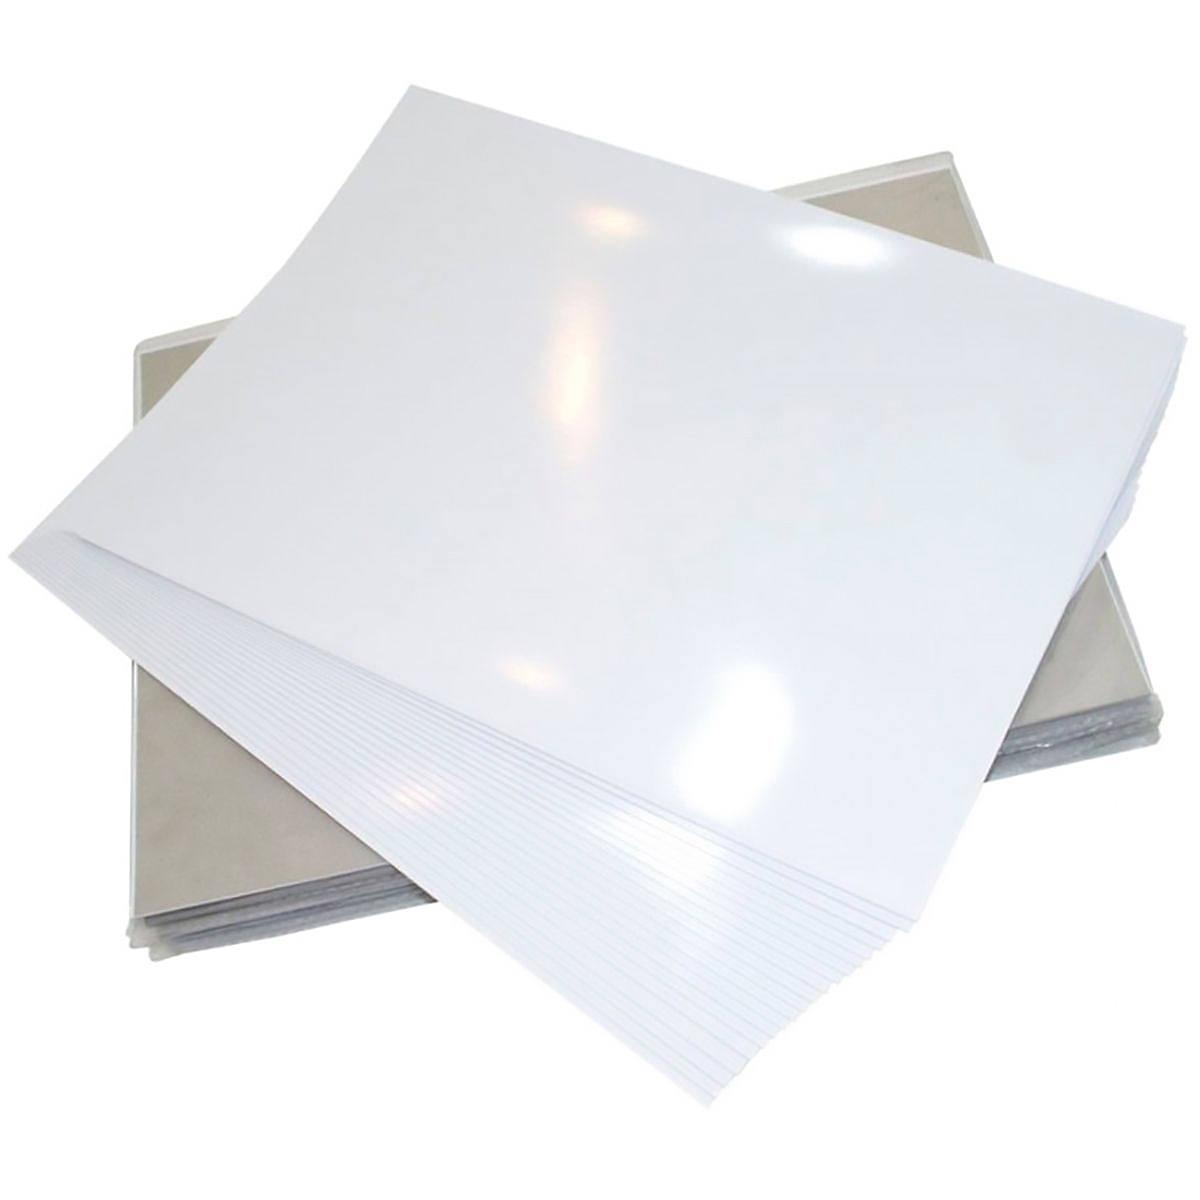 Papel Fotográfico Dupla Face 120g A4 Branco Brilhante Resistente à Água / 50 Folhas